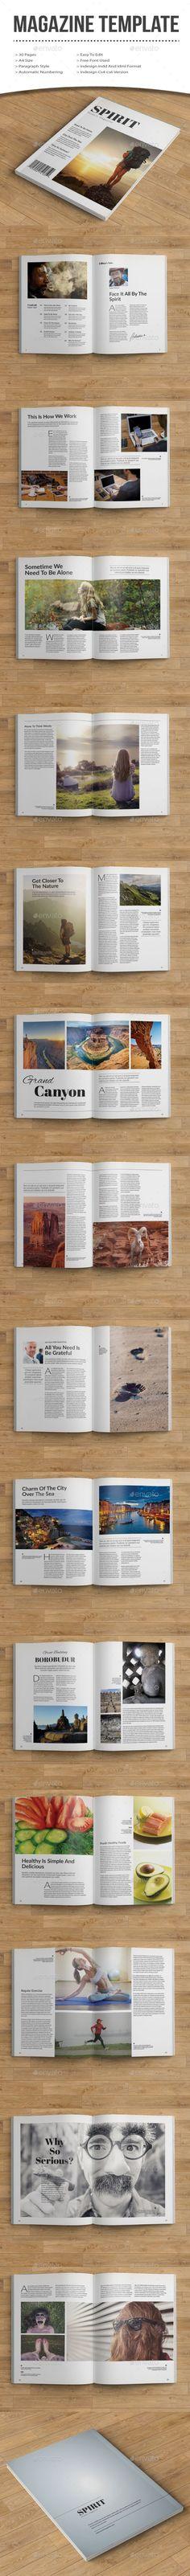 Spirit Magazine Template #design #journal Download: http://graphicriver.net/item/spirit-magazine/10731004?ref=ksioks